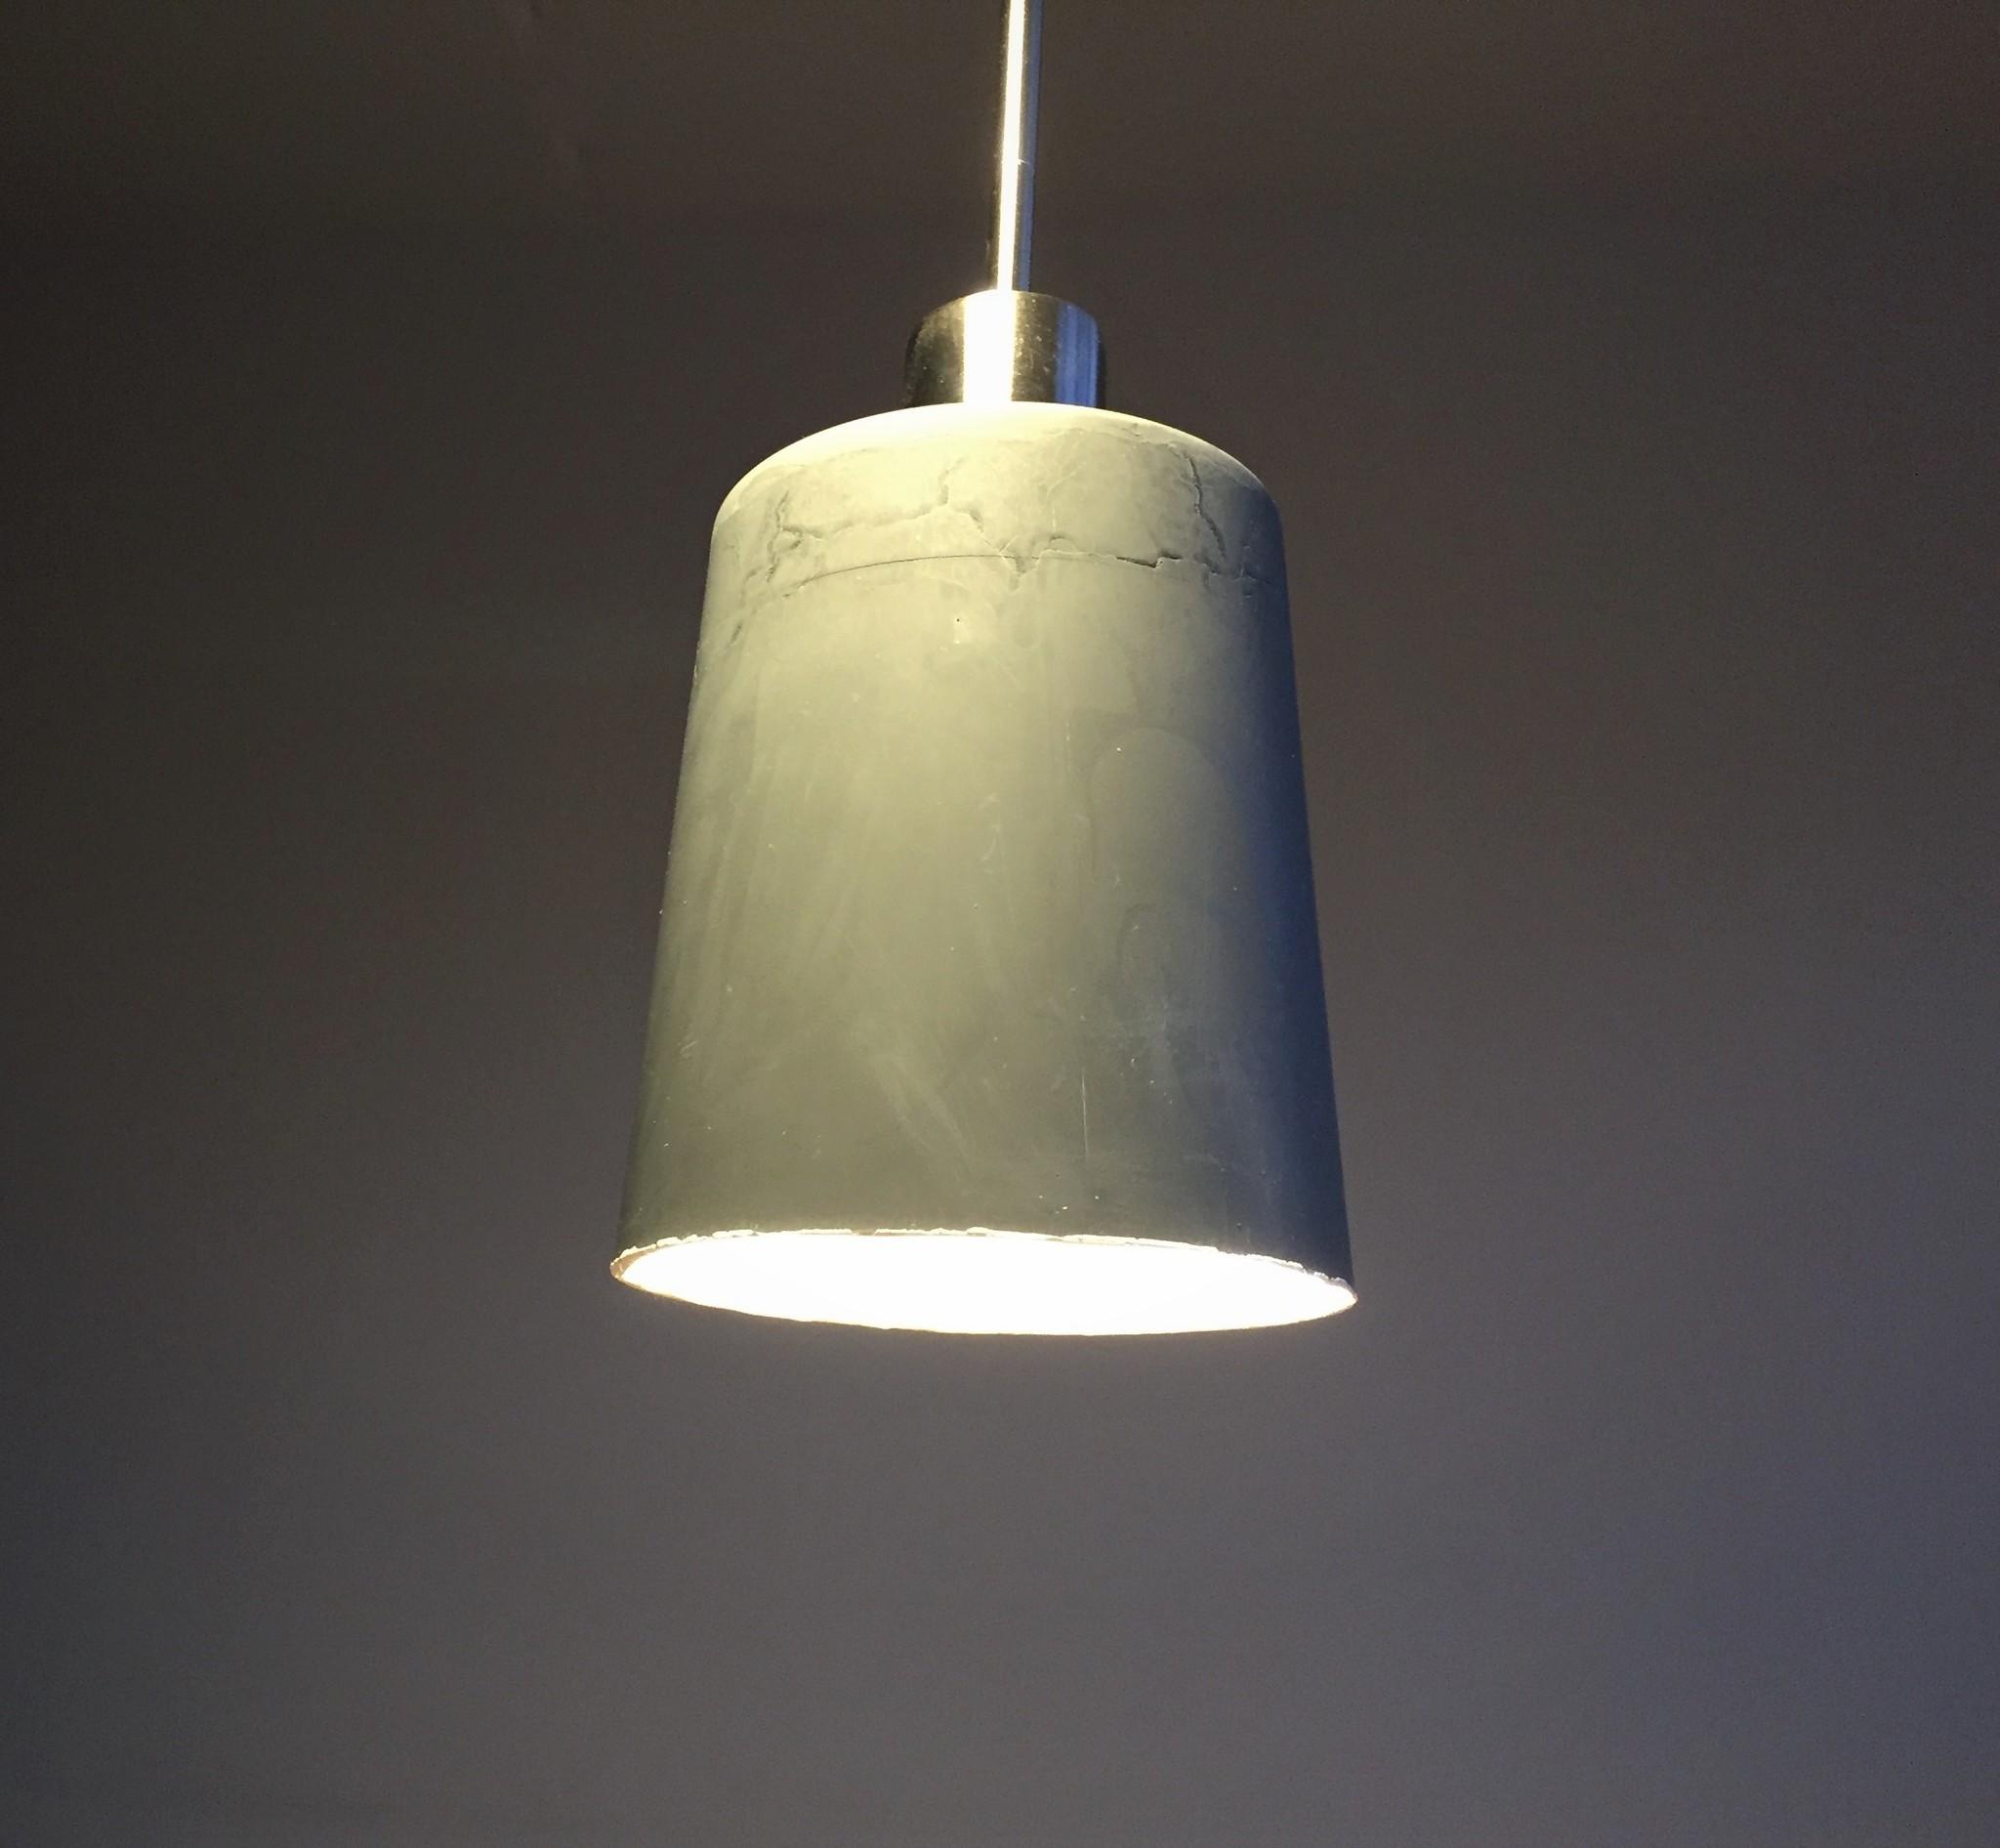 Lampe aus Acryl gegossen